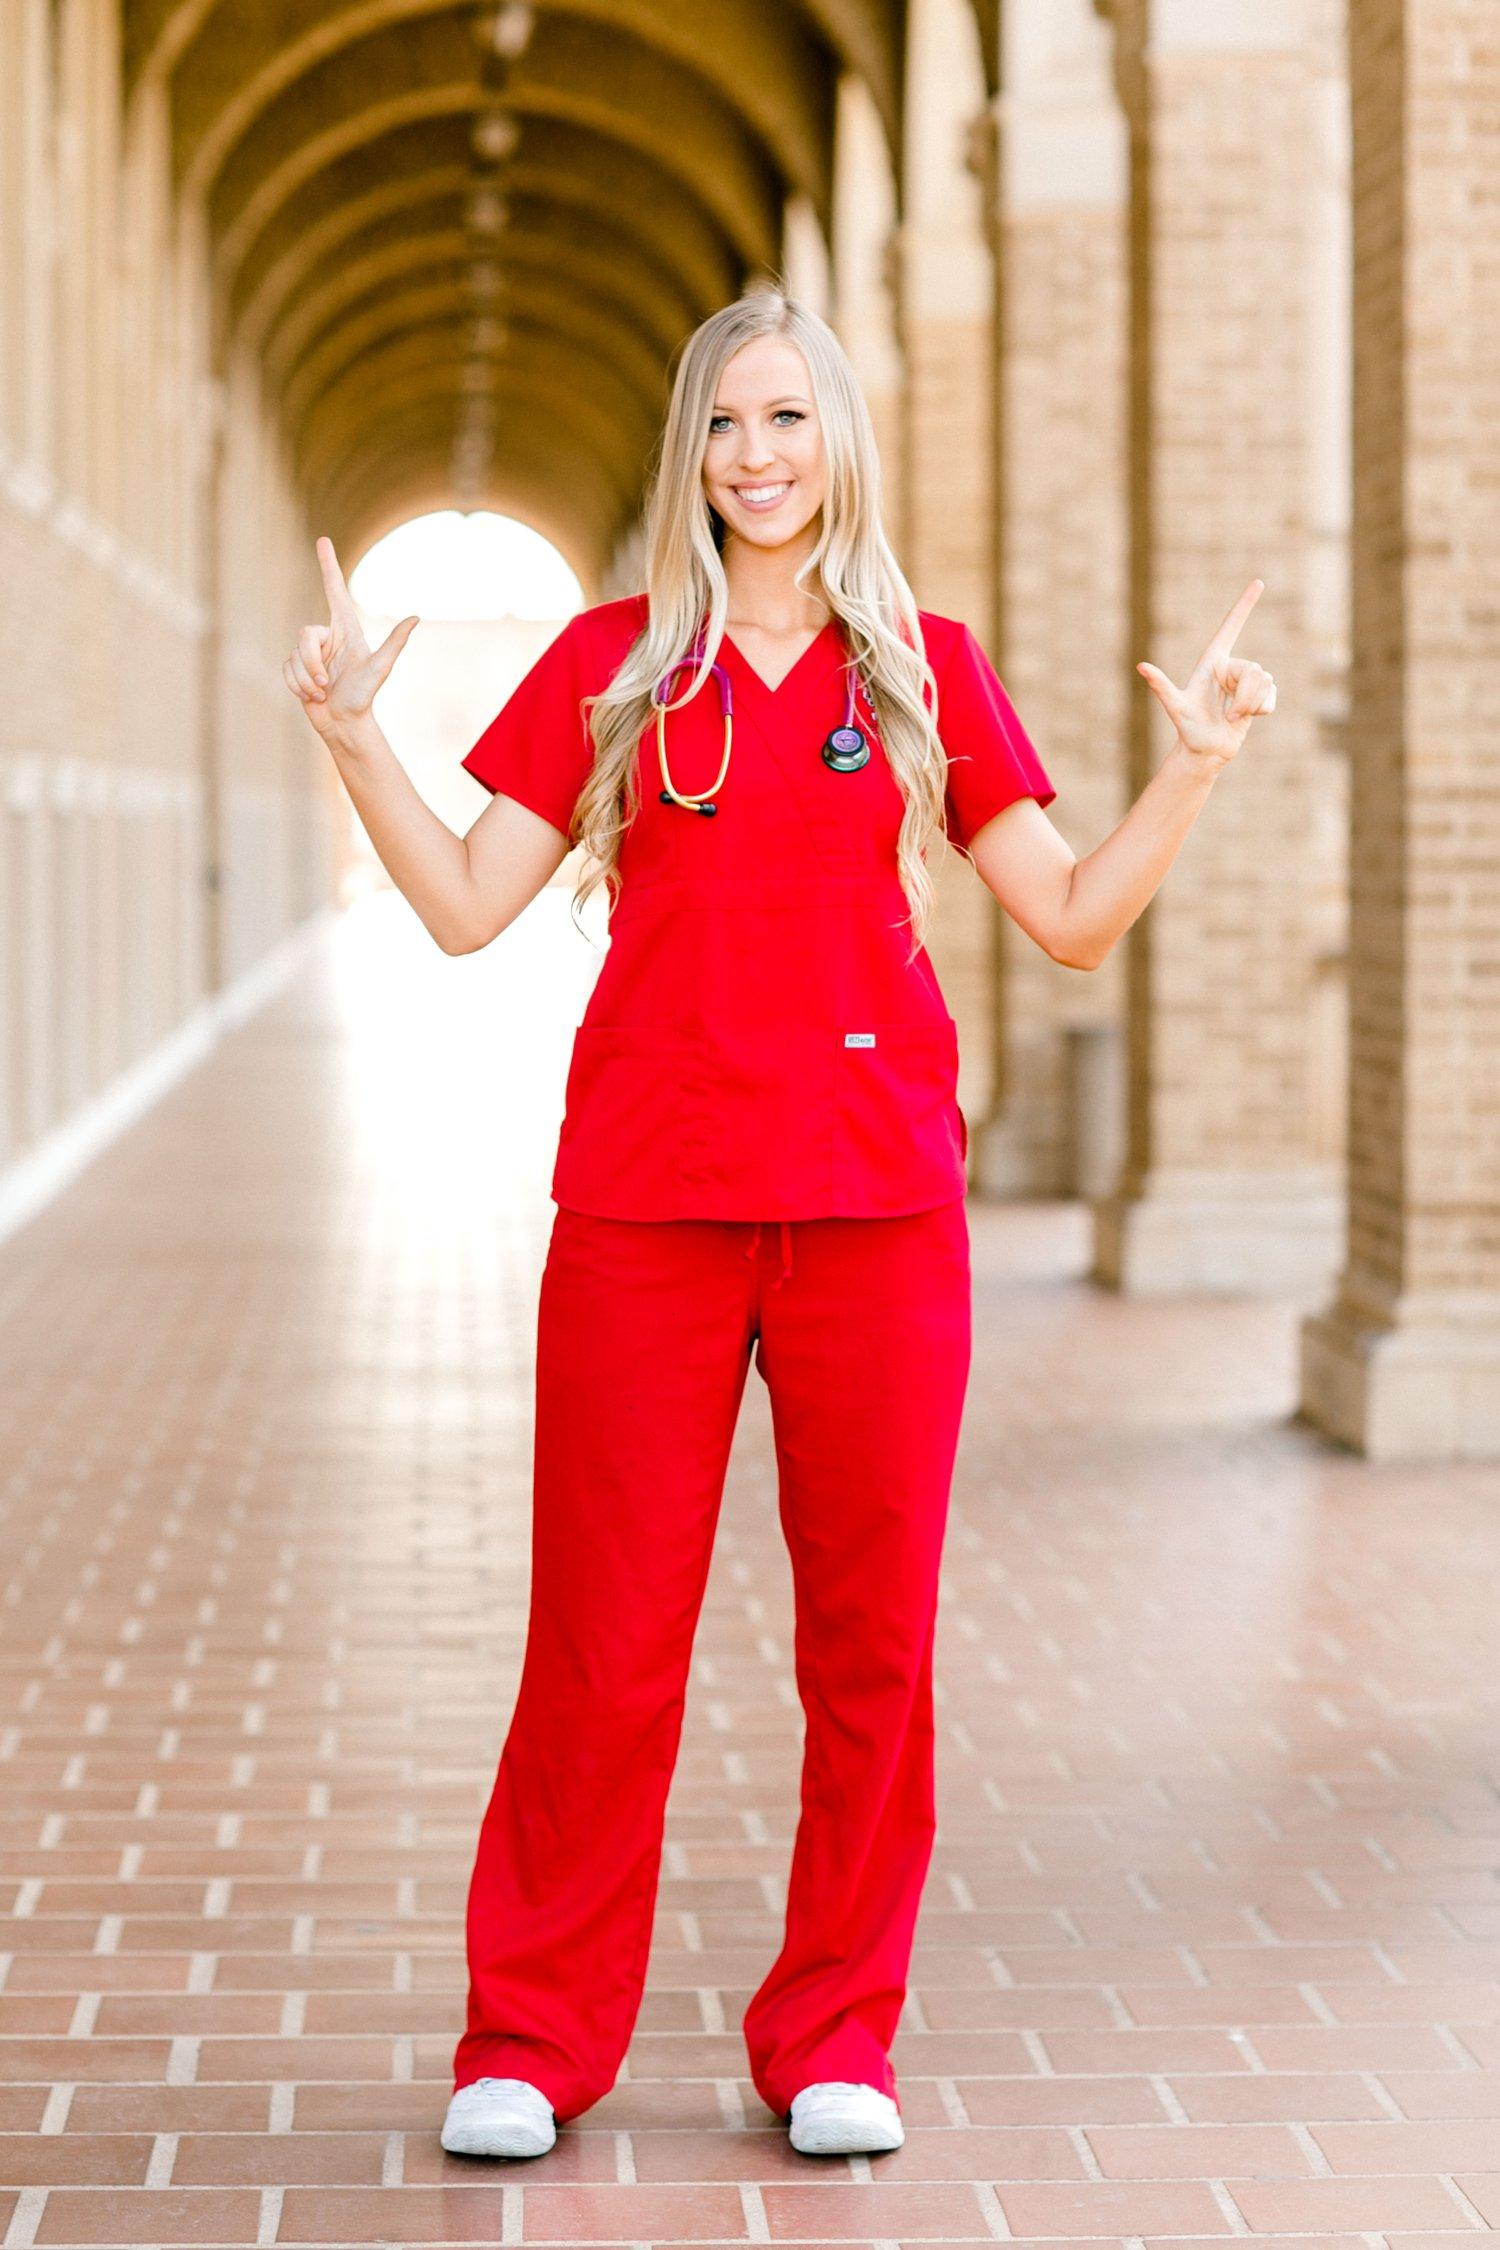 Sydney-stavley-austin-sojourner-texas-tech-health-sciences-center-lubbock-senior-photographer-0024.jpg